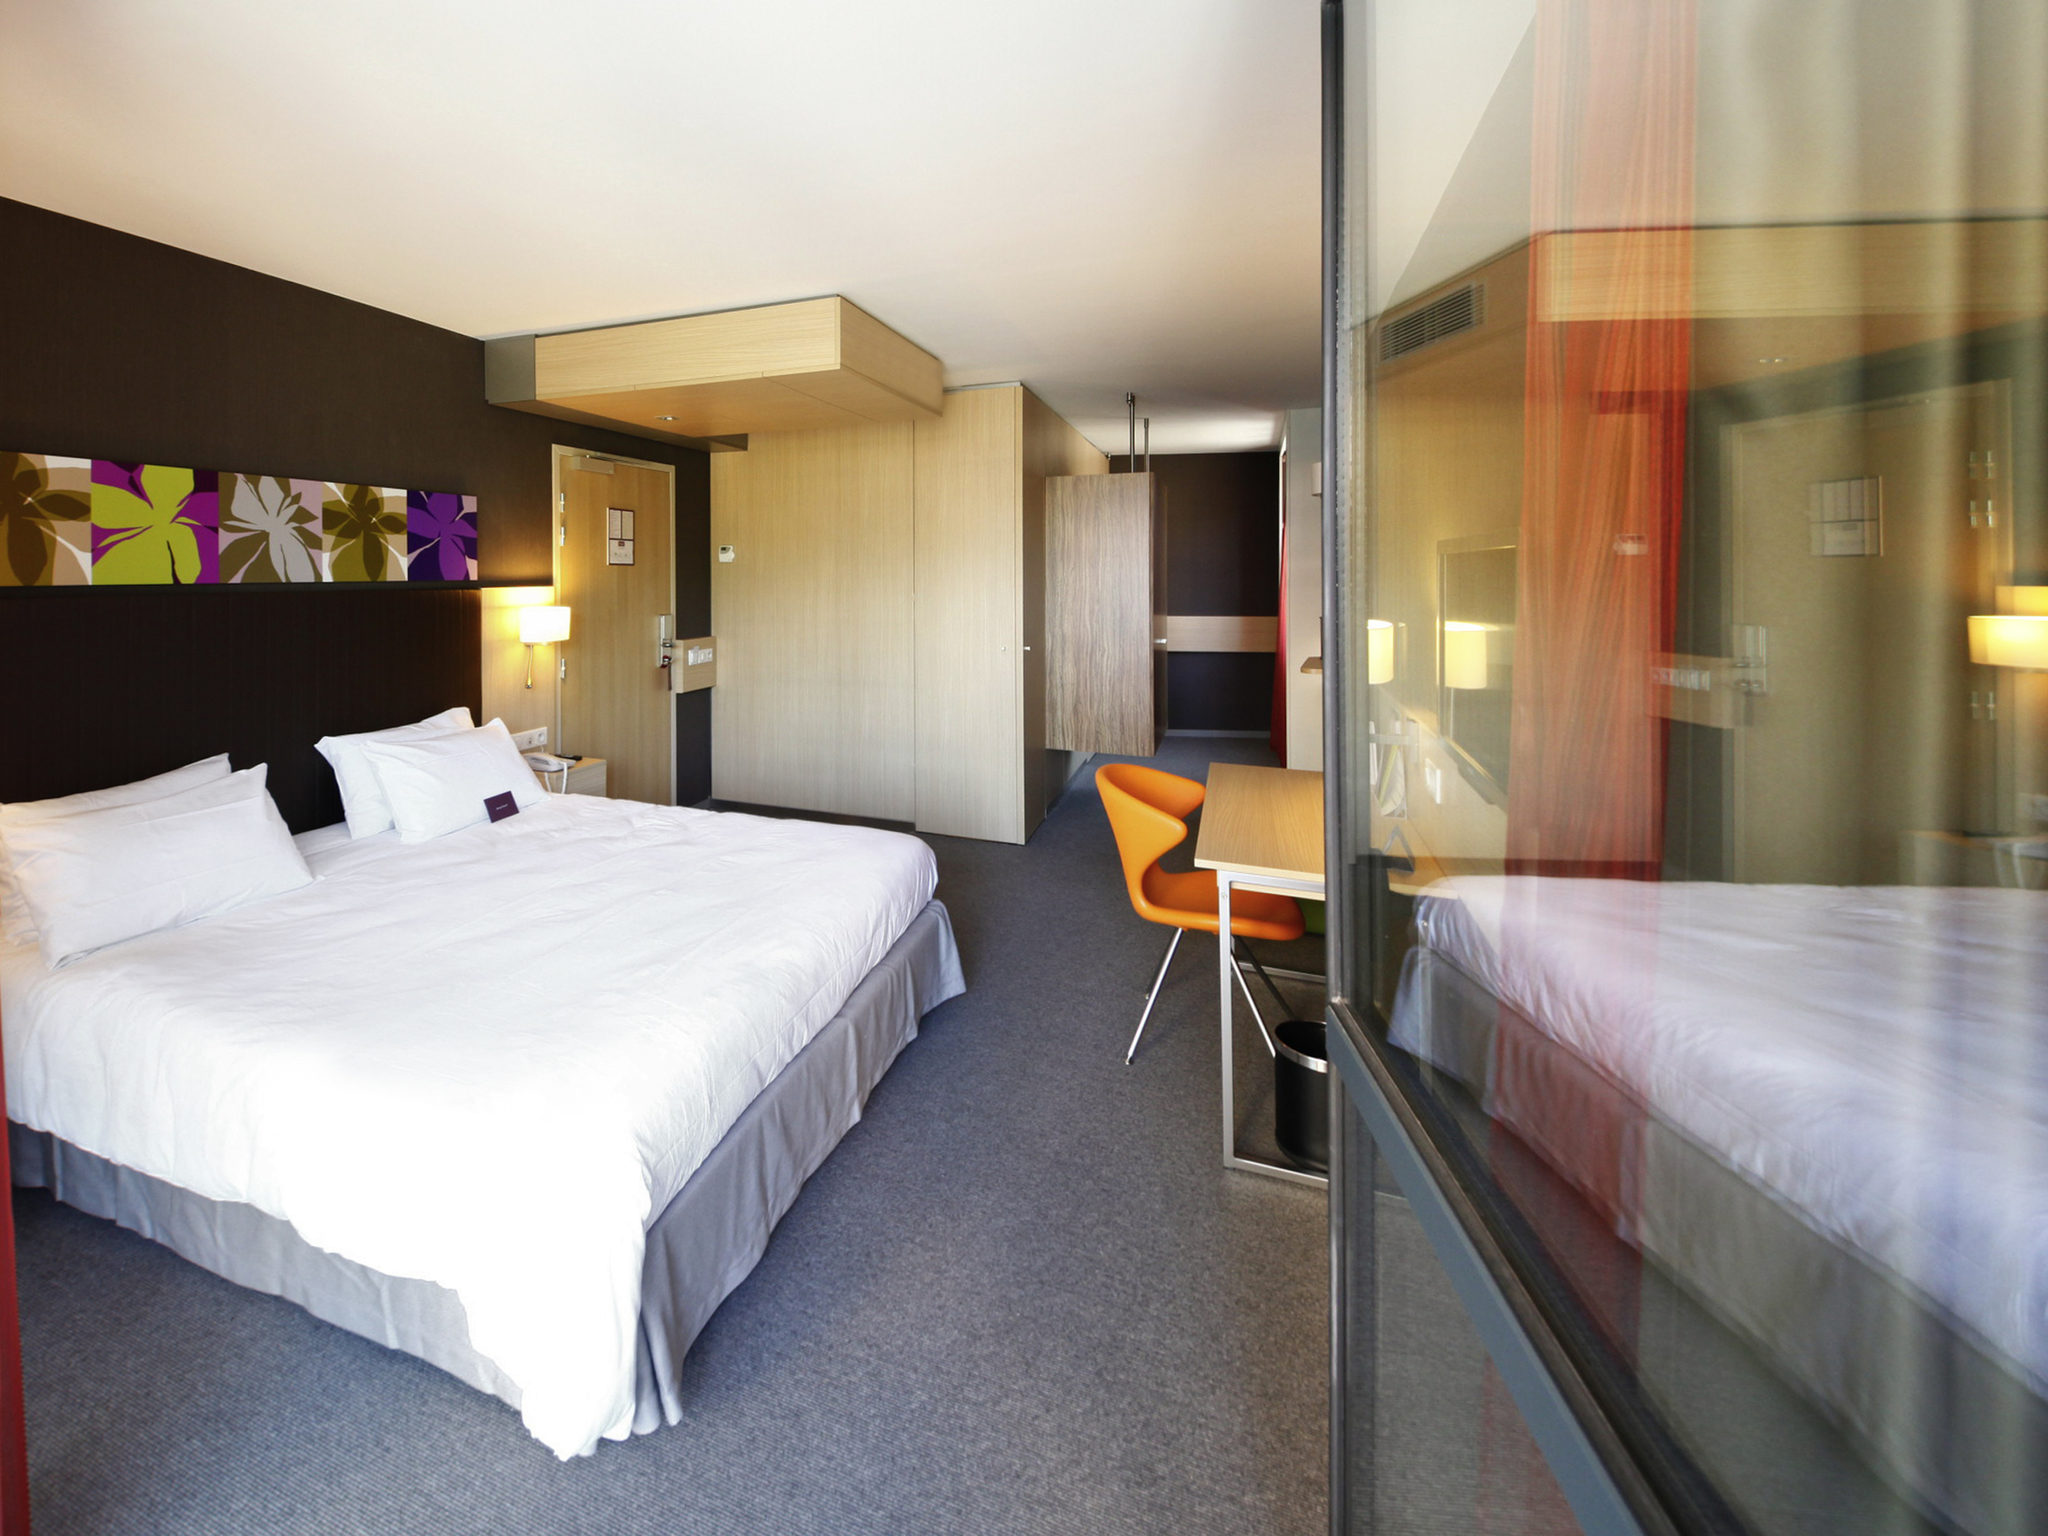 Hotel – Albergo Mercure Valenciennes Centre